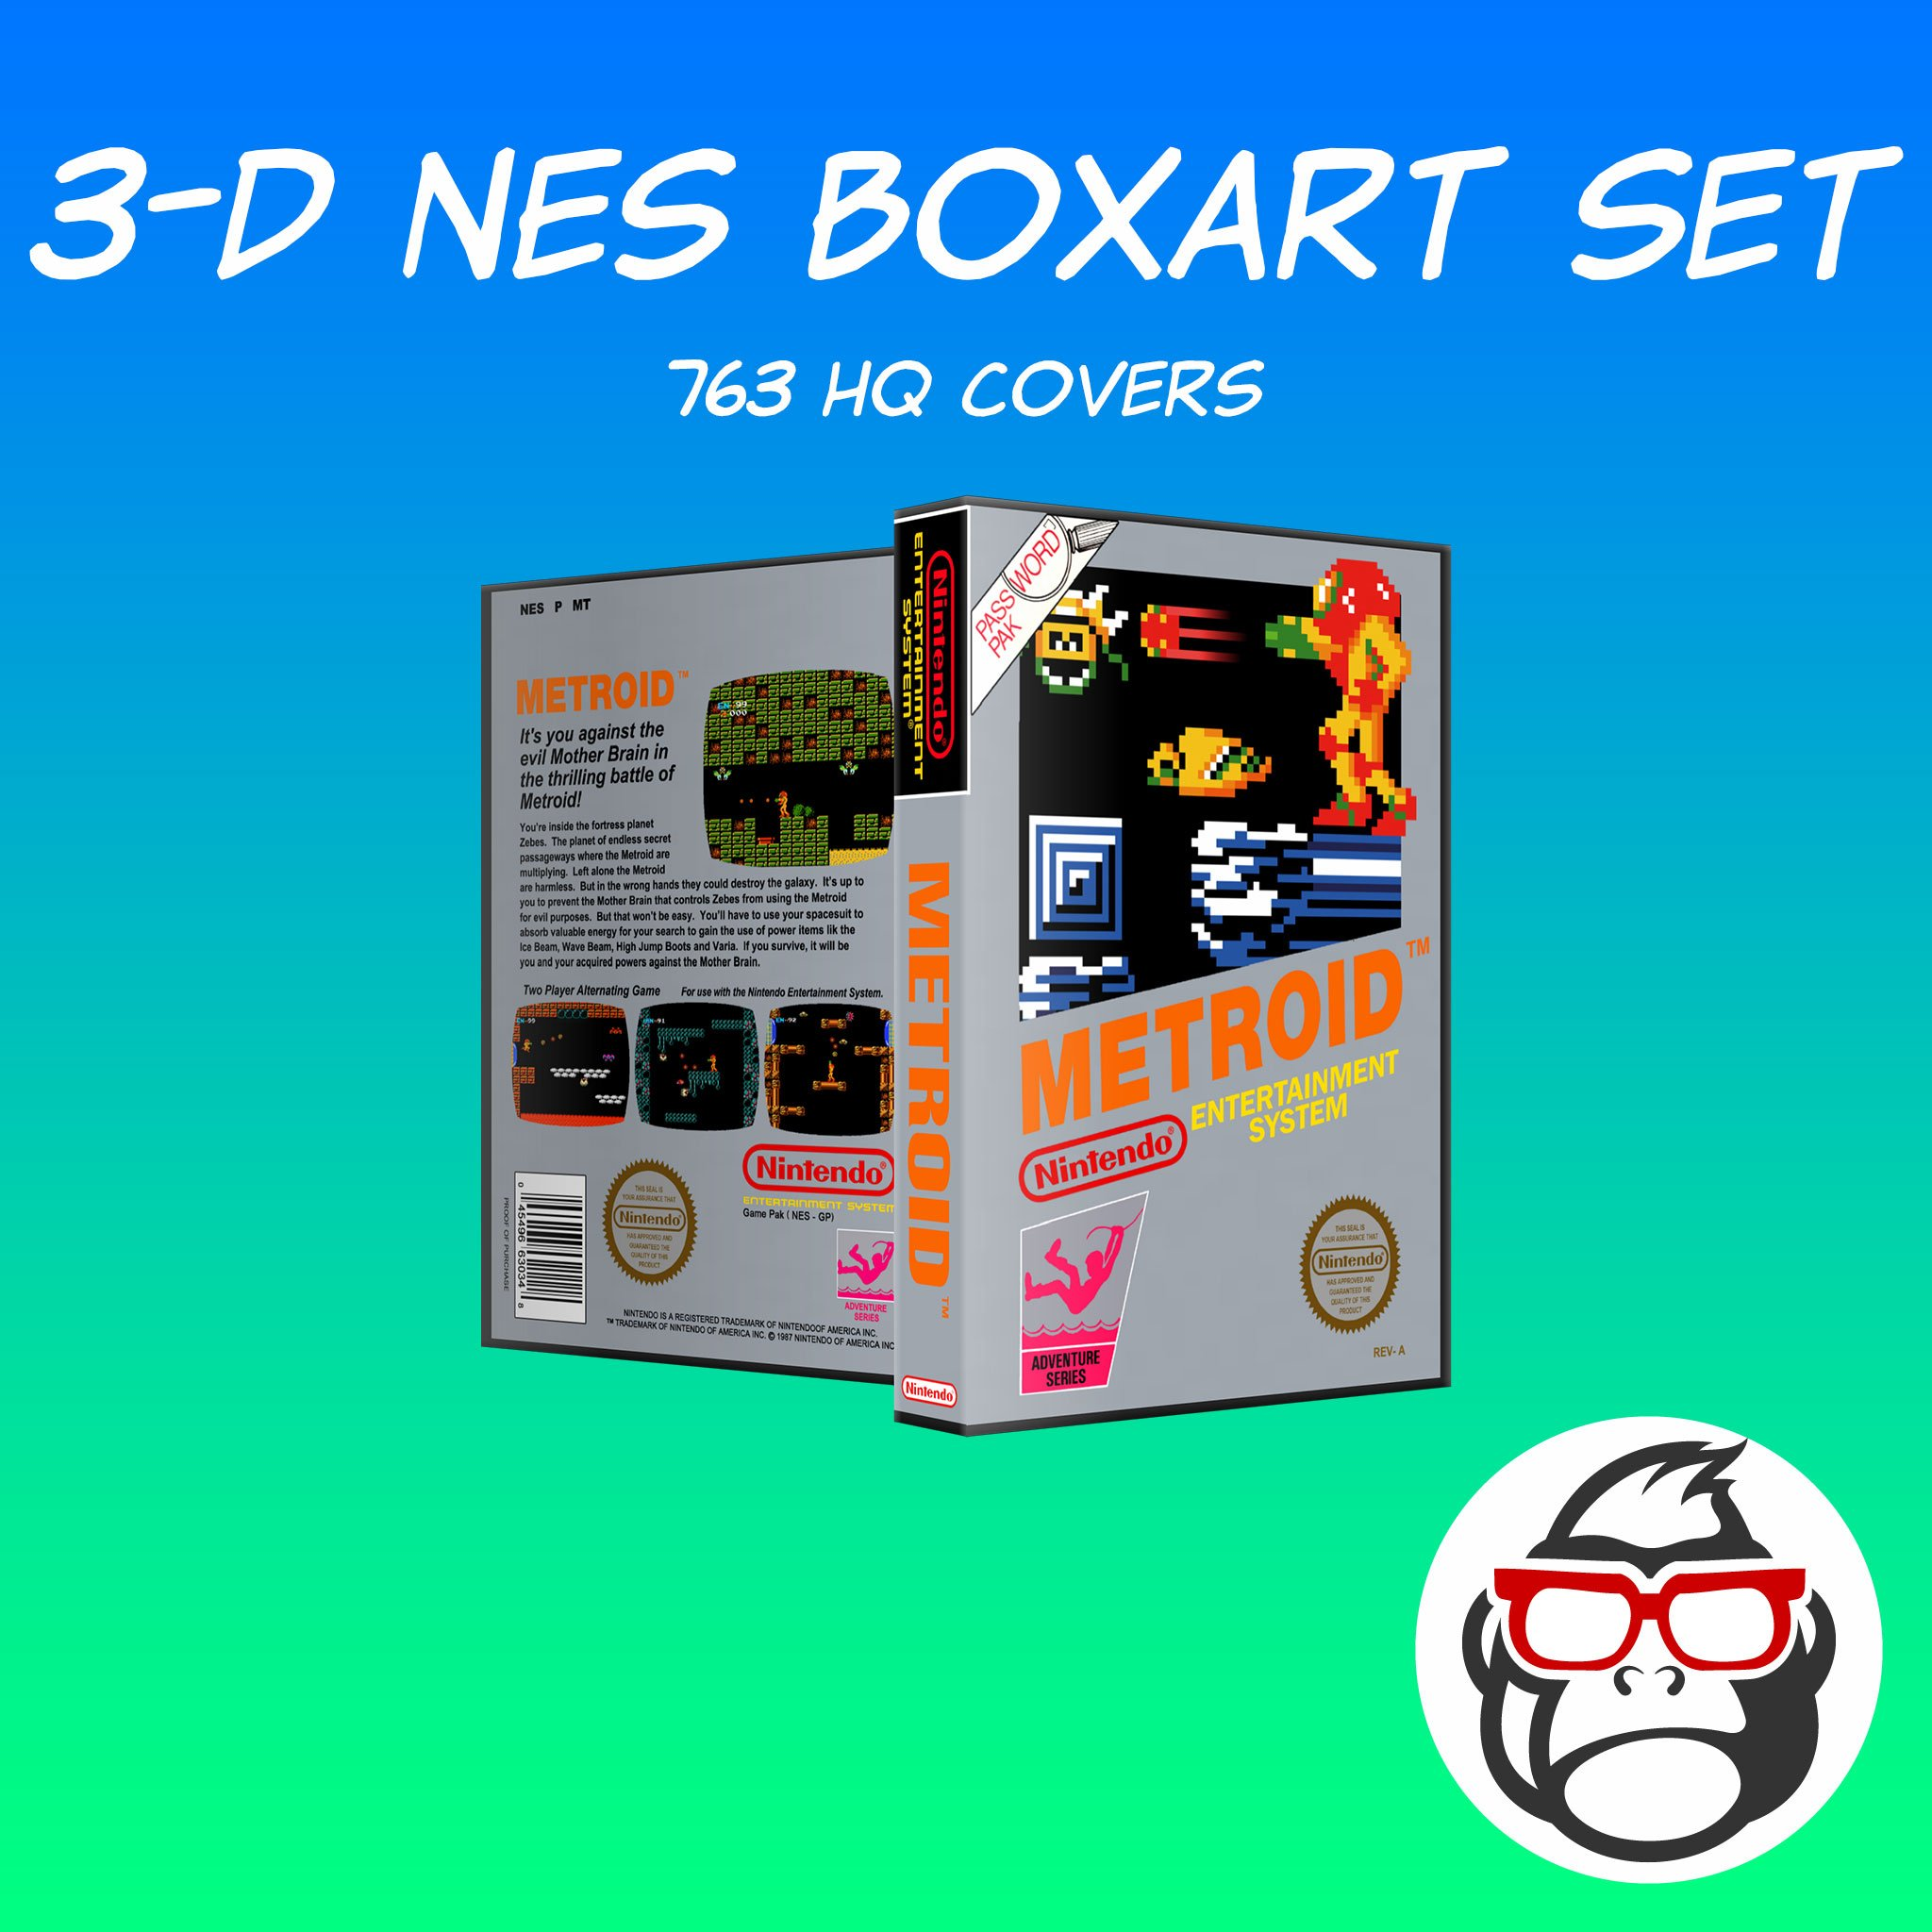 Grila's HQ 3-D NES Boxart - Game Box Art - LaunchBox